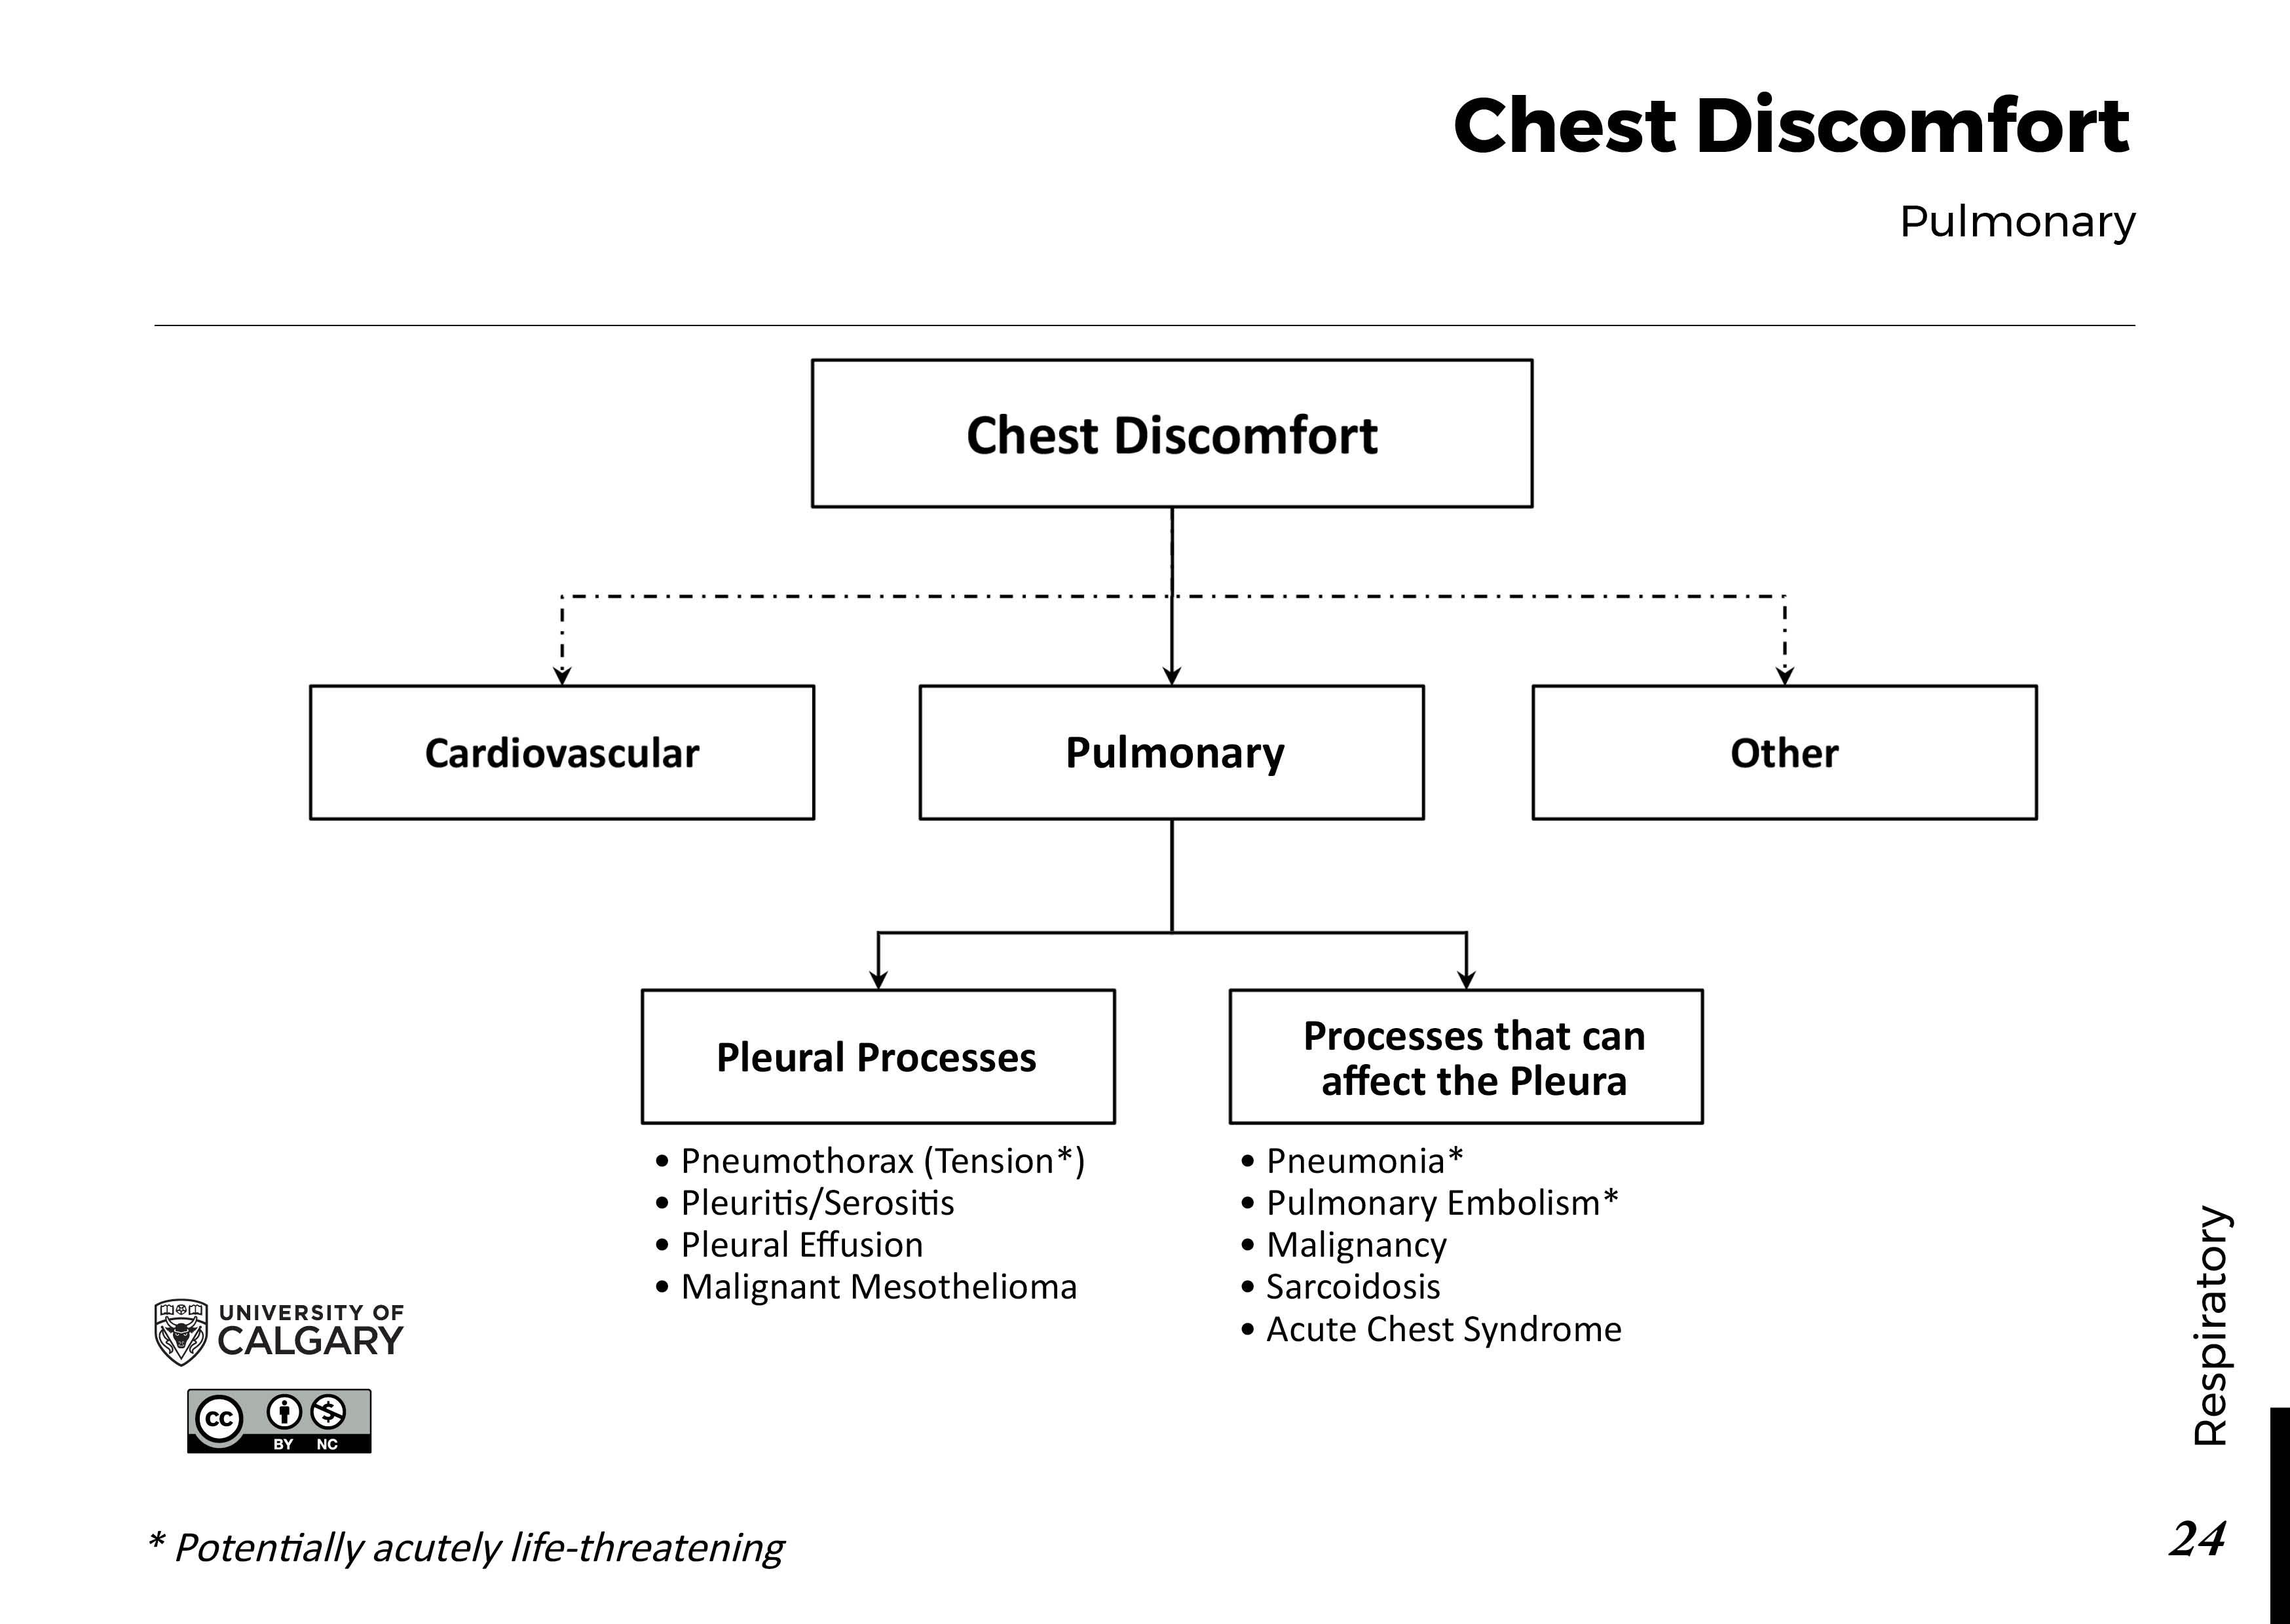 CHEST DISCOMFORT: Pulmonary/Mediastinal Scheme